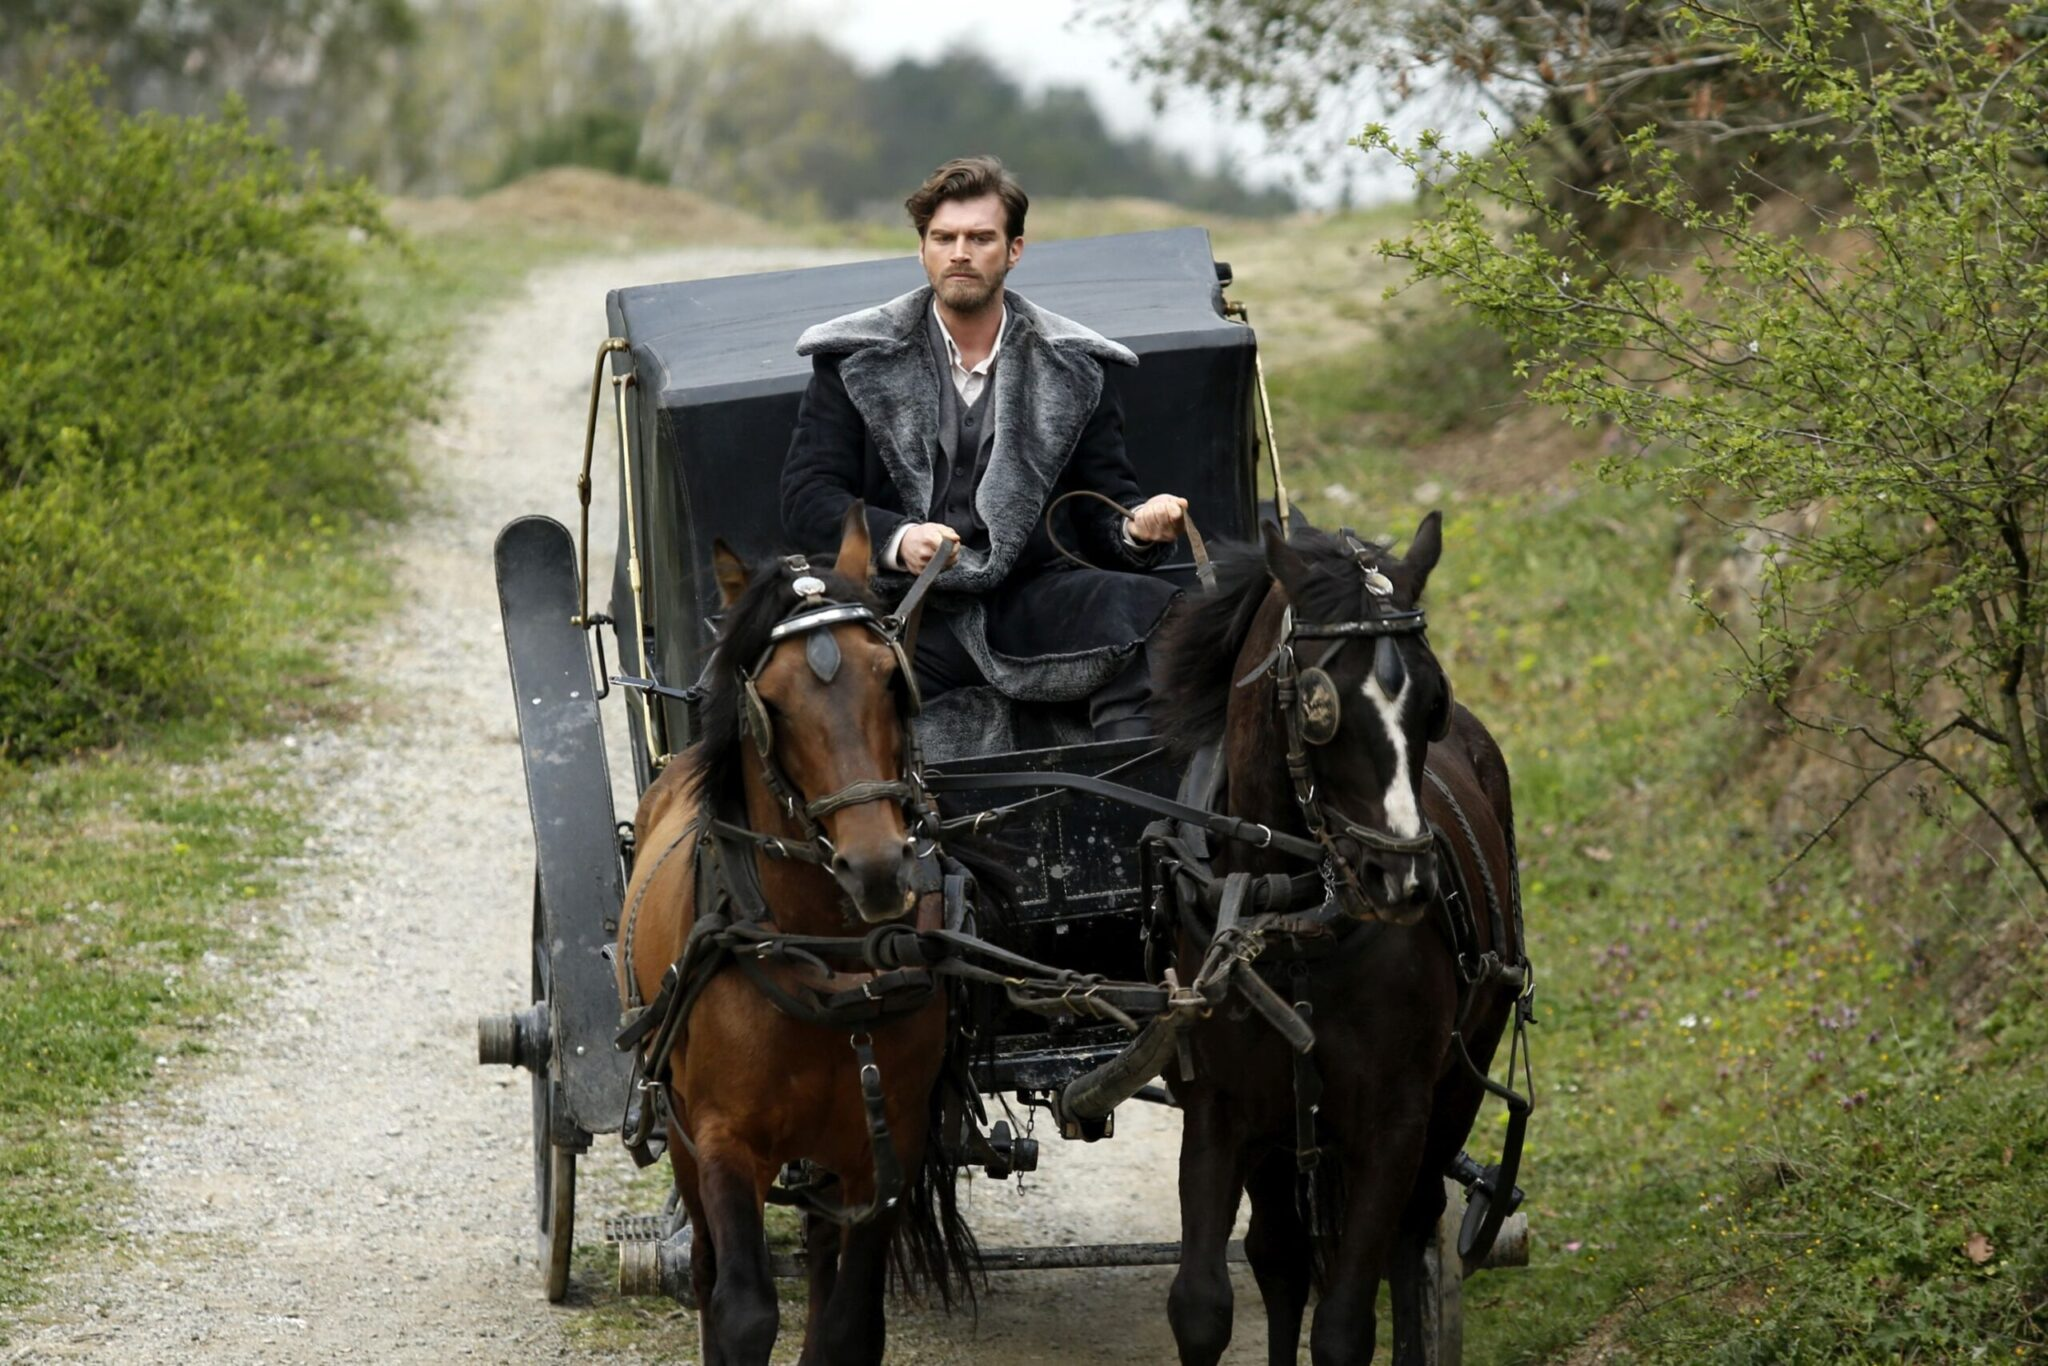 Aspettando Brave and Beautiful, da lunedì alle 14:45 su Canale5, conosciamo meglio Kıvanç Tatlıtuğ, il protagonista della serie Cesur ve Guzel